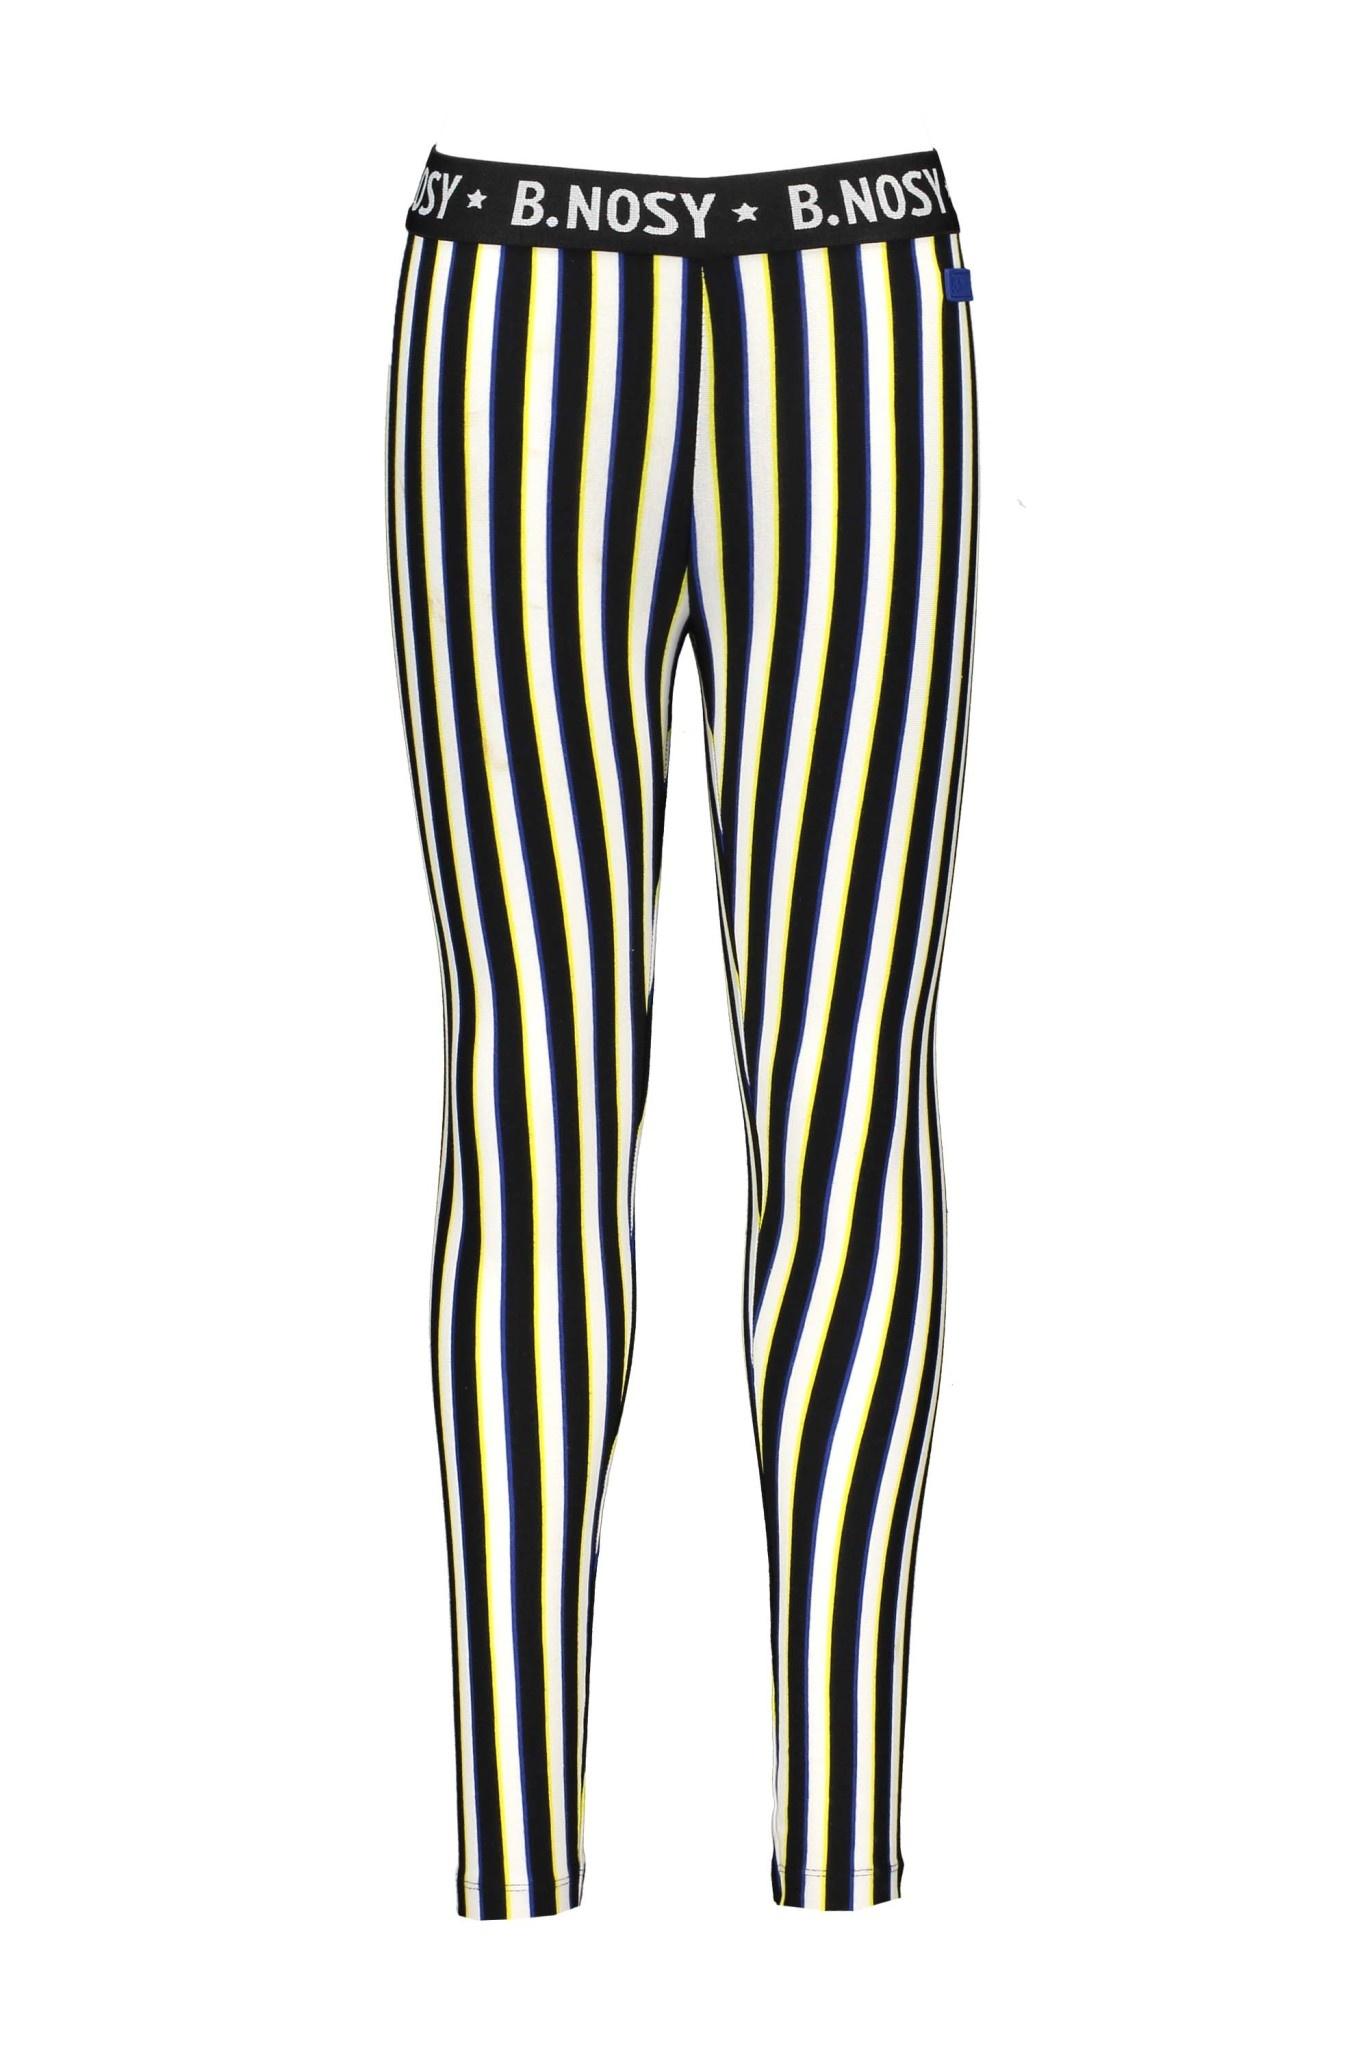 B.Nosy Meisjes YDS Legging Y002-5510-1